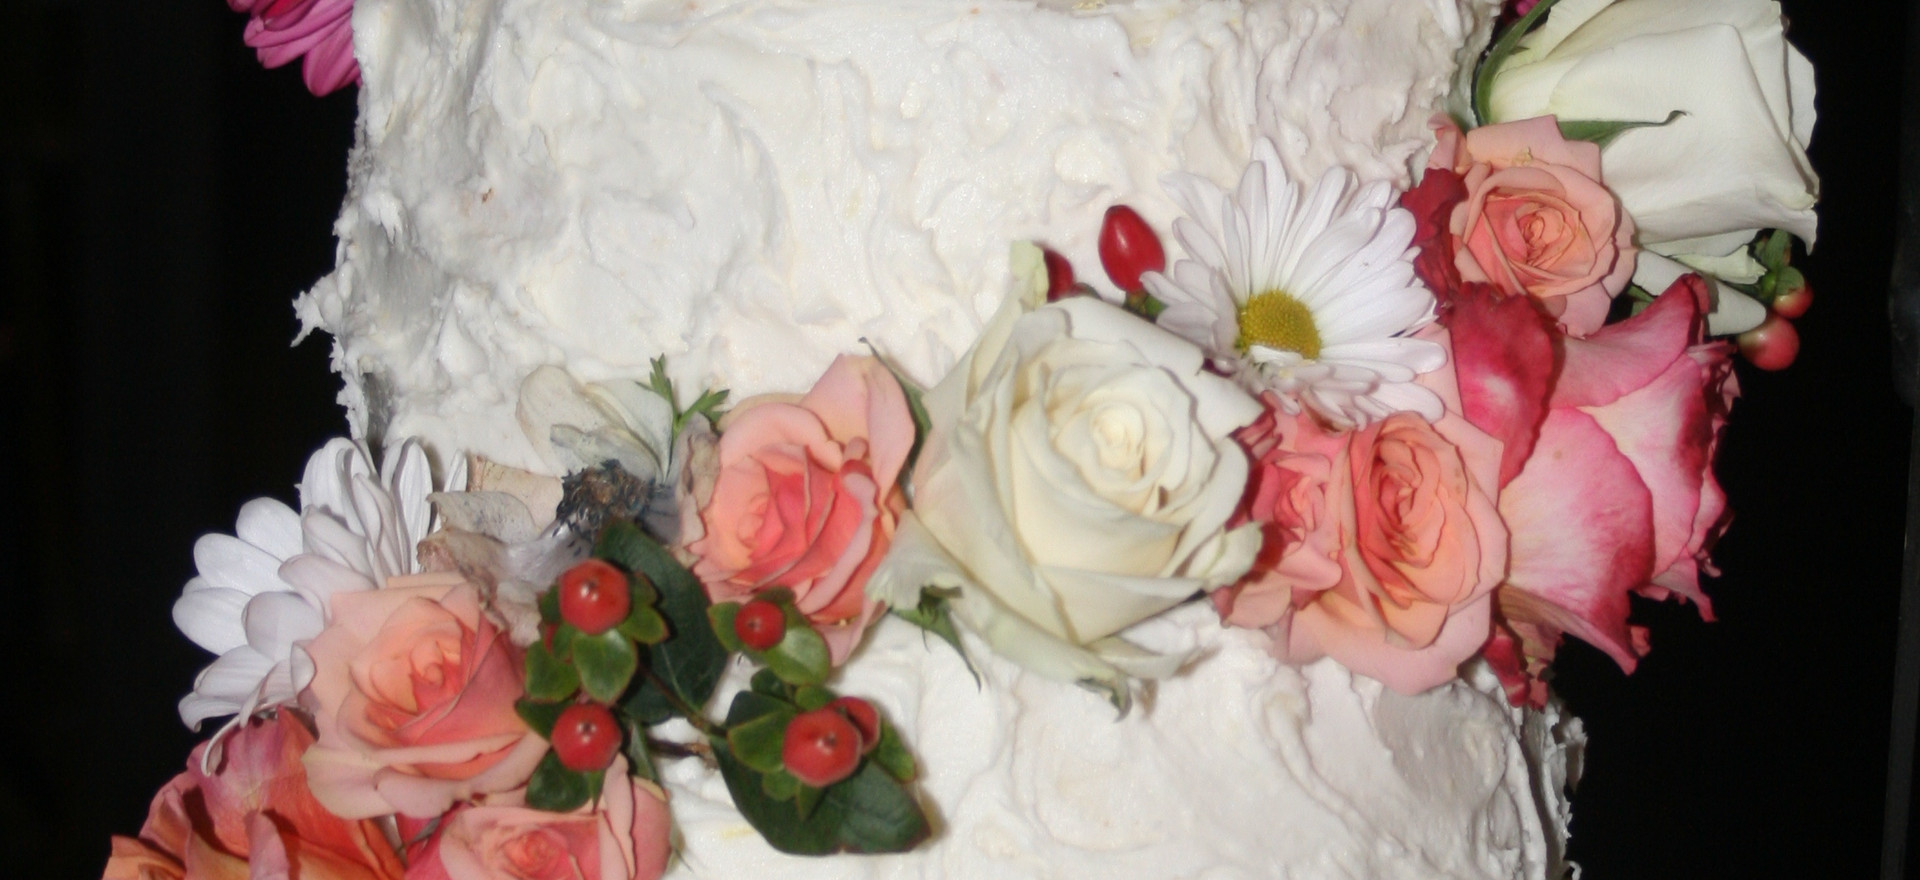 We Make Cakes!